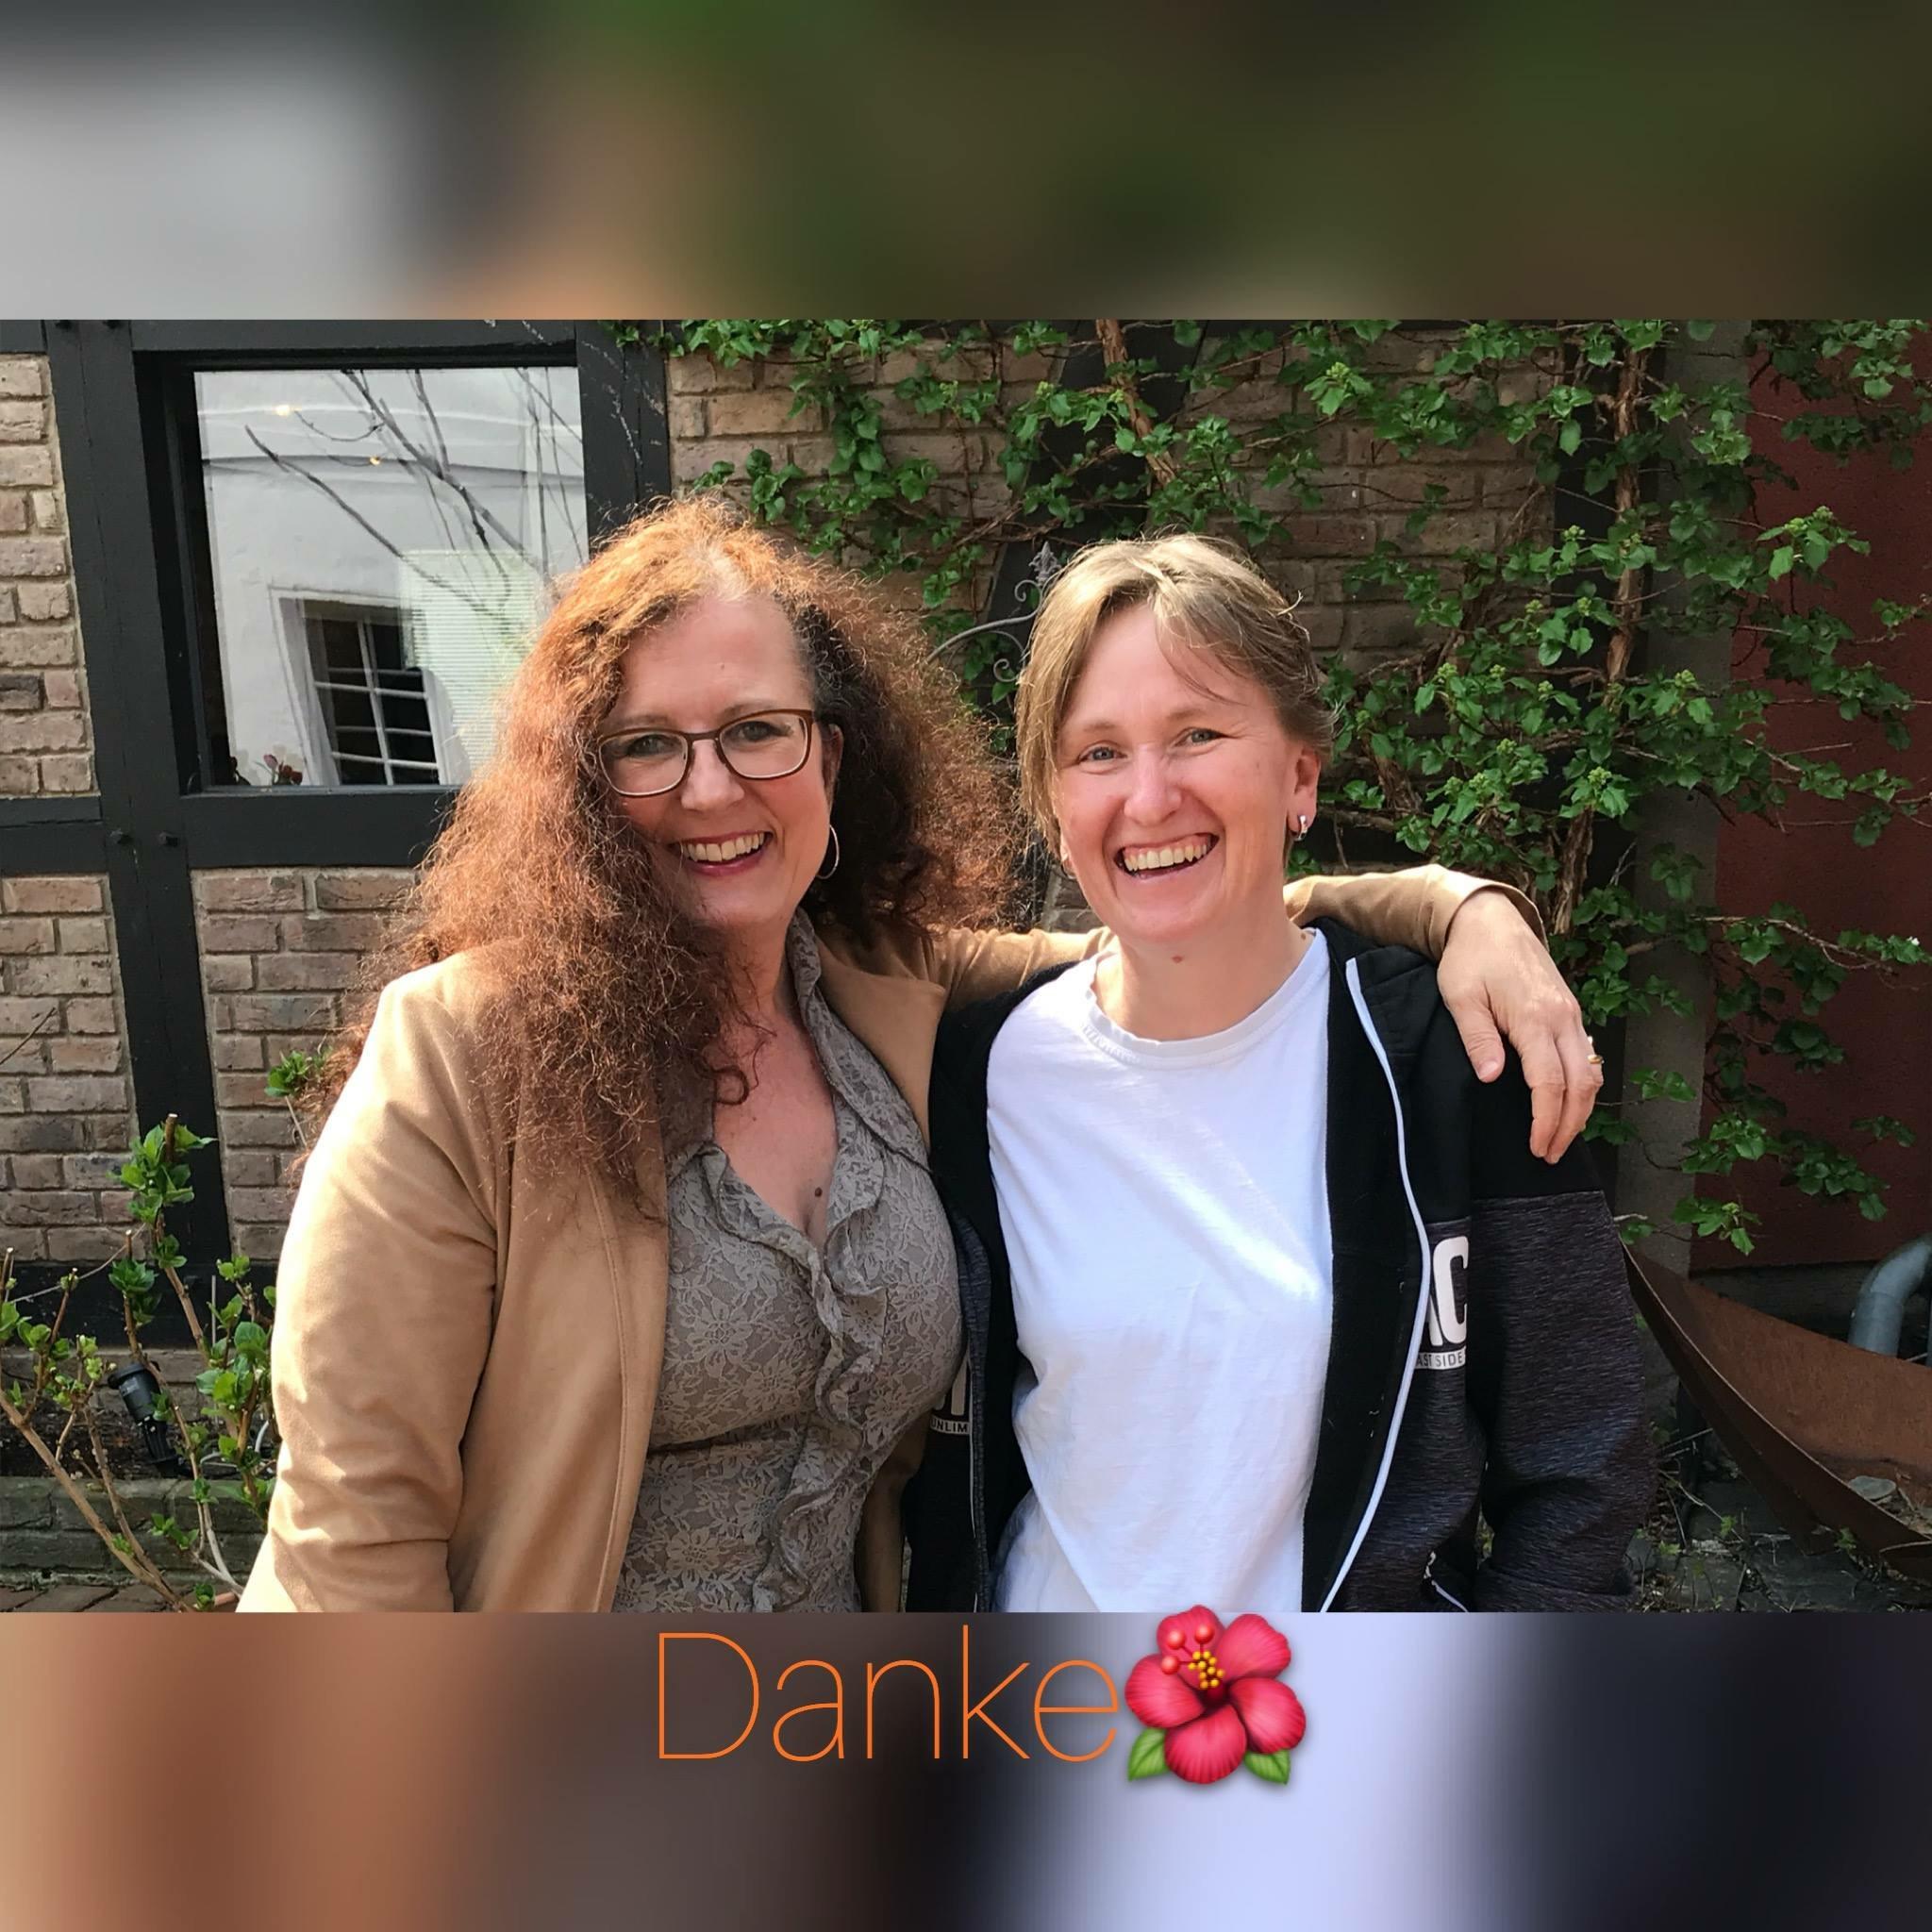 Sonja Mannhardt, Dipl. oecotroph. & Anja Schneider, Diätassistentin